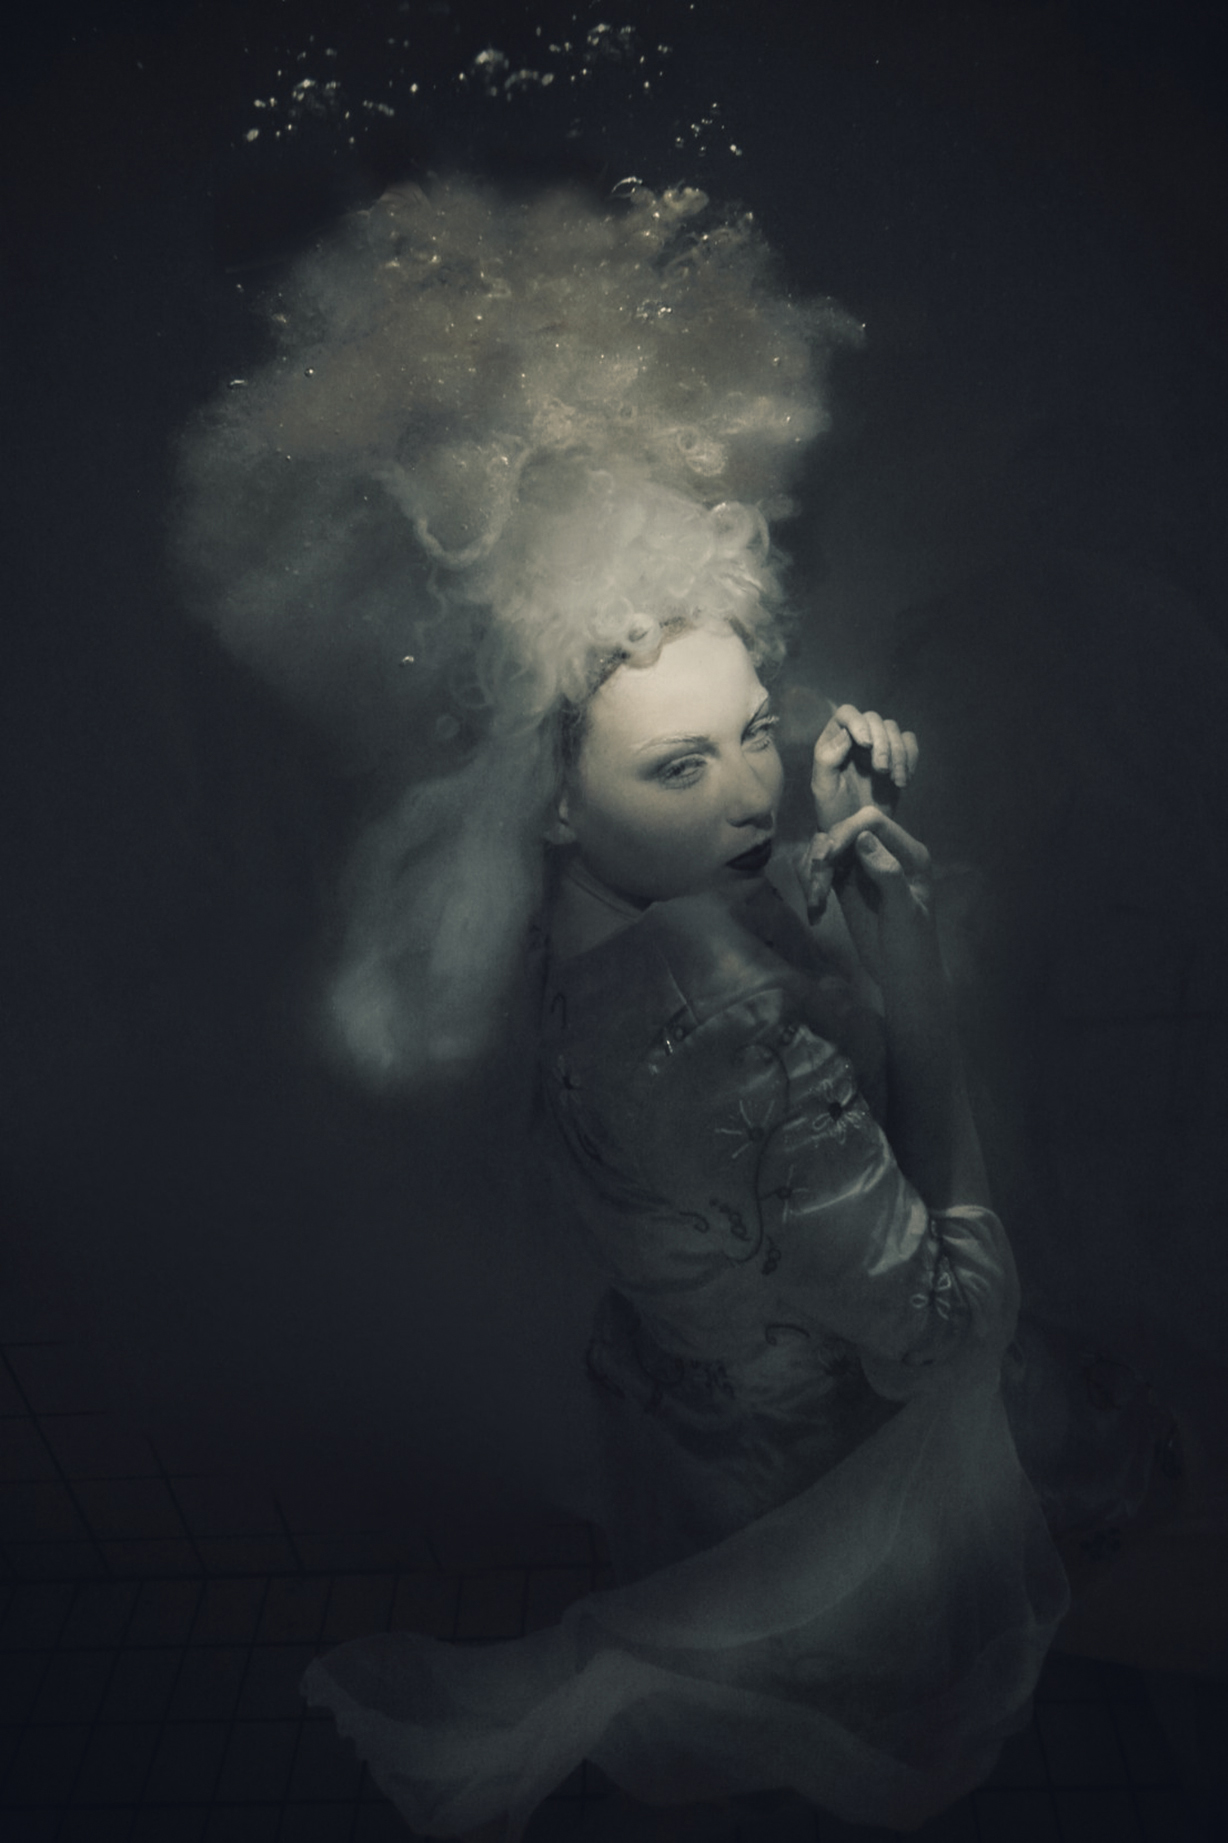 Gabriele Viertel Photography (Viertel.photomotion) - Kaat Van Pelt - mua Sarah Alderliesten - dsg TaylorMadeBride